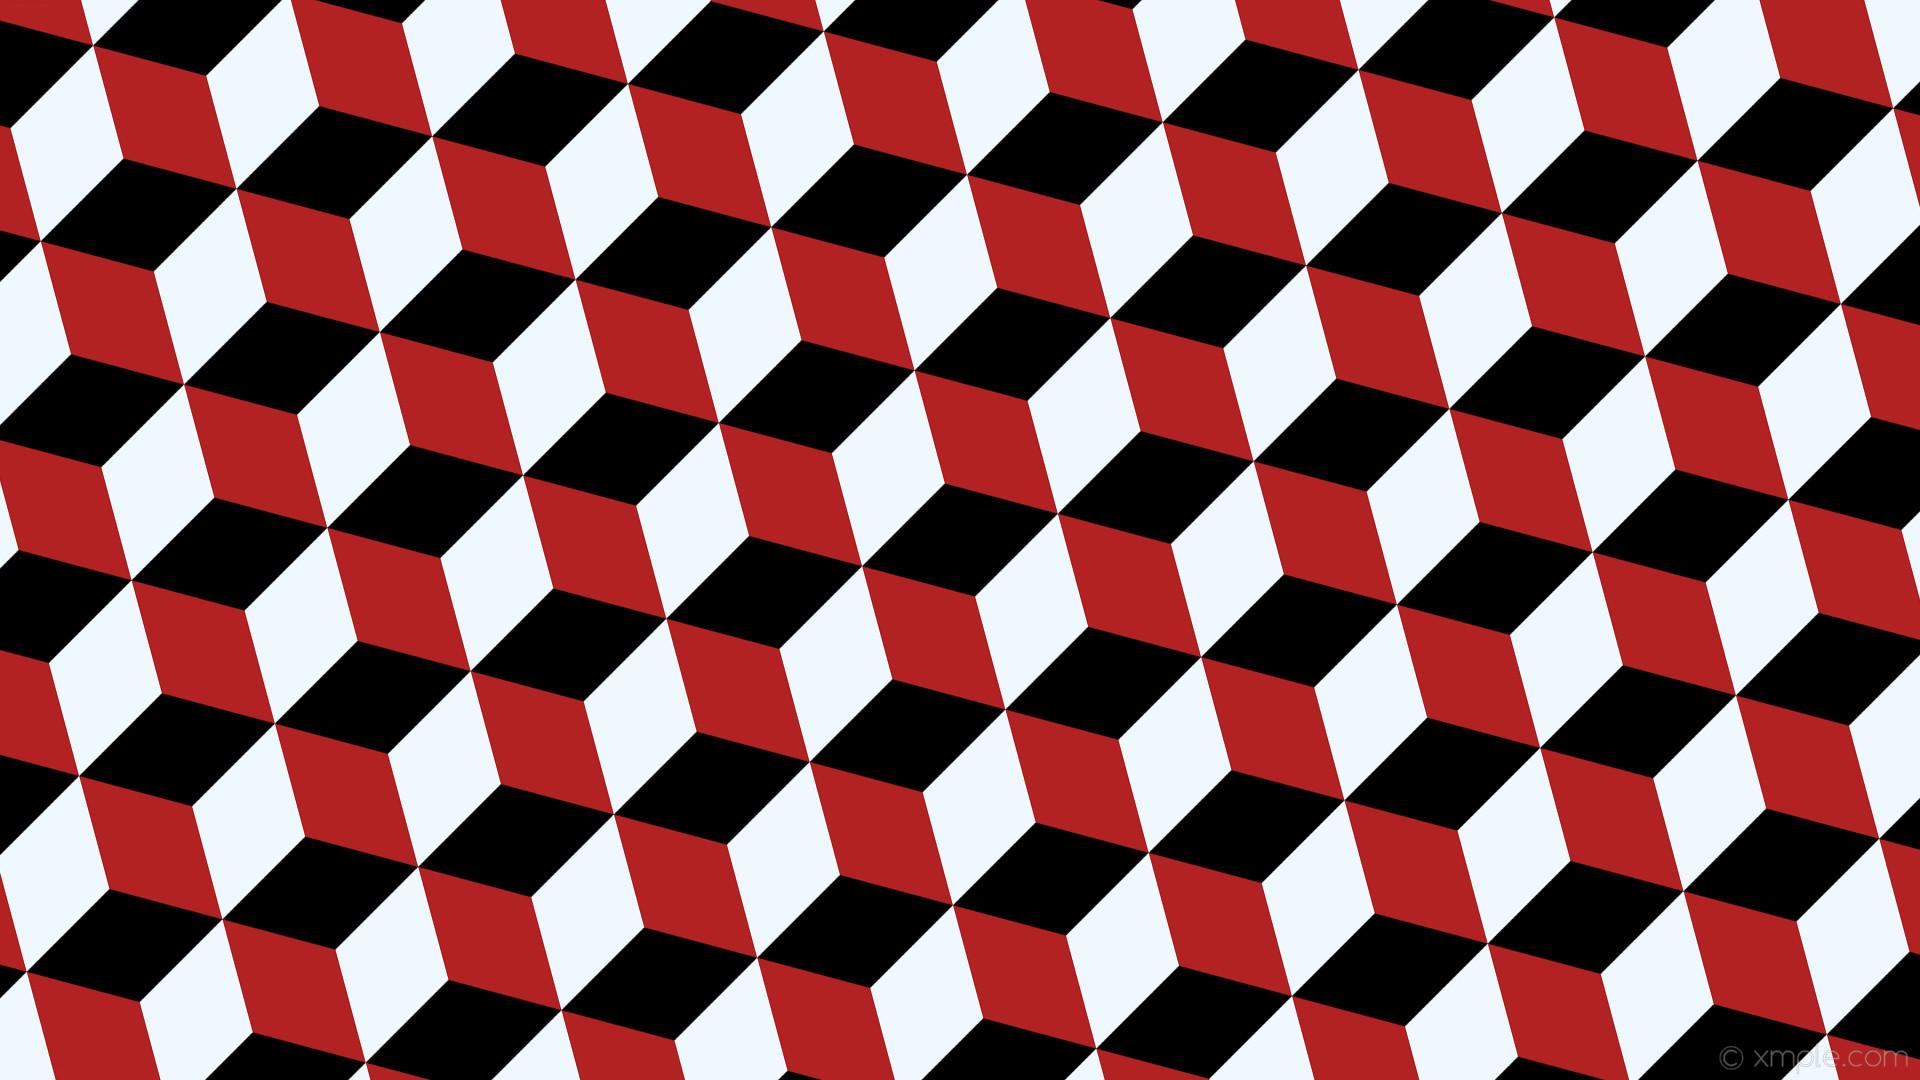 wallpaper red 3d cubes white black fire brick alice blue #000000 #b22222  #f0f8ff